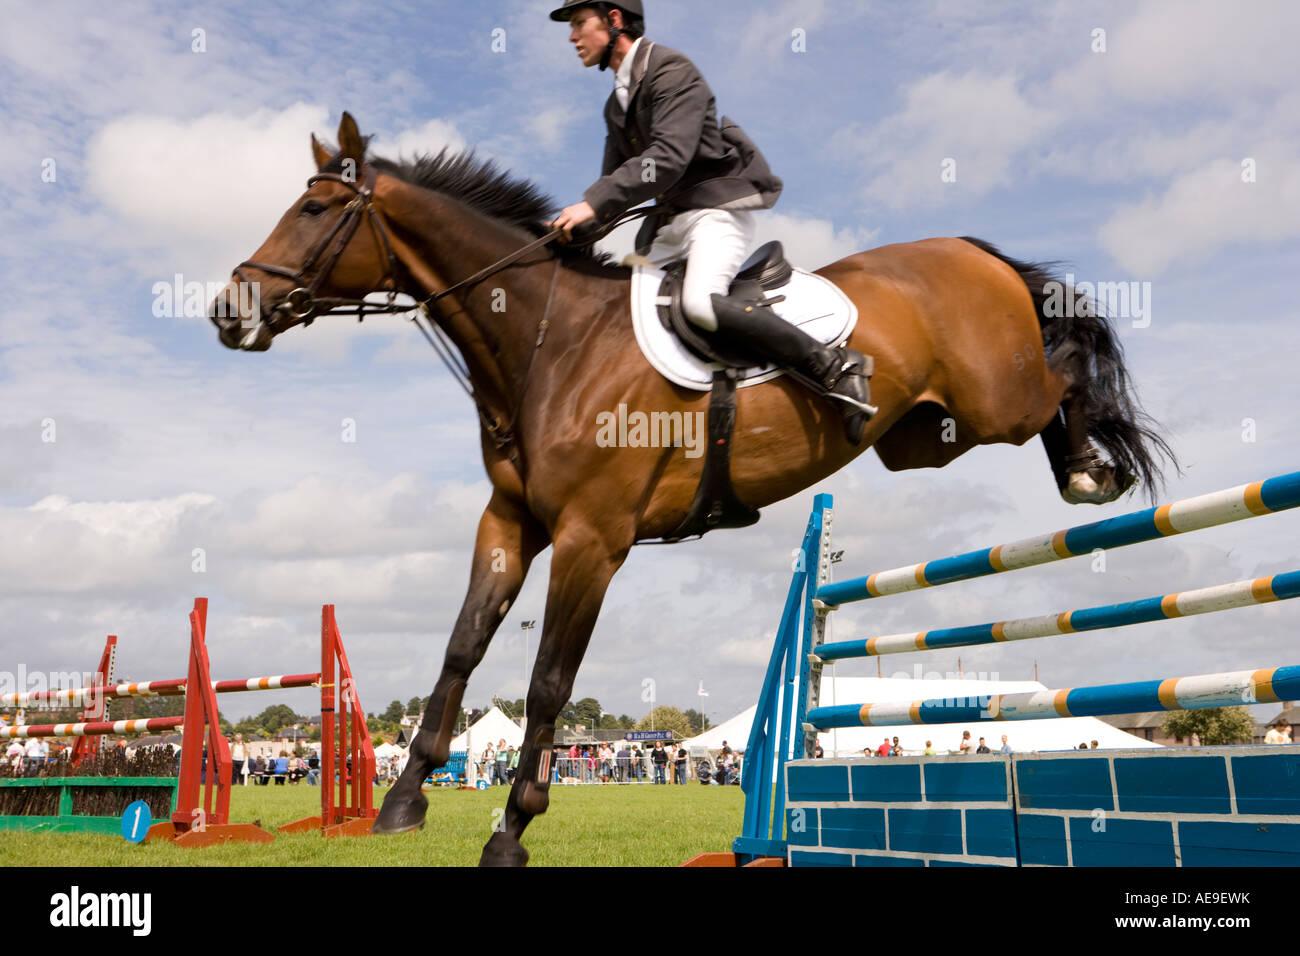 Horses free jumping